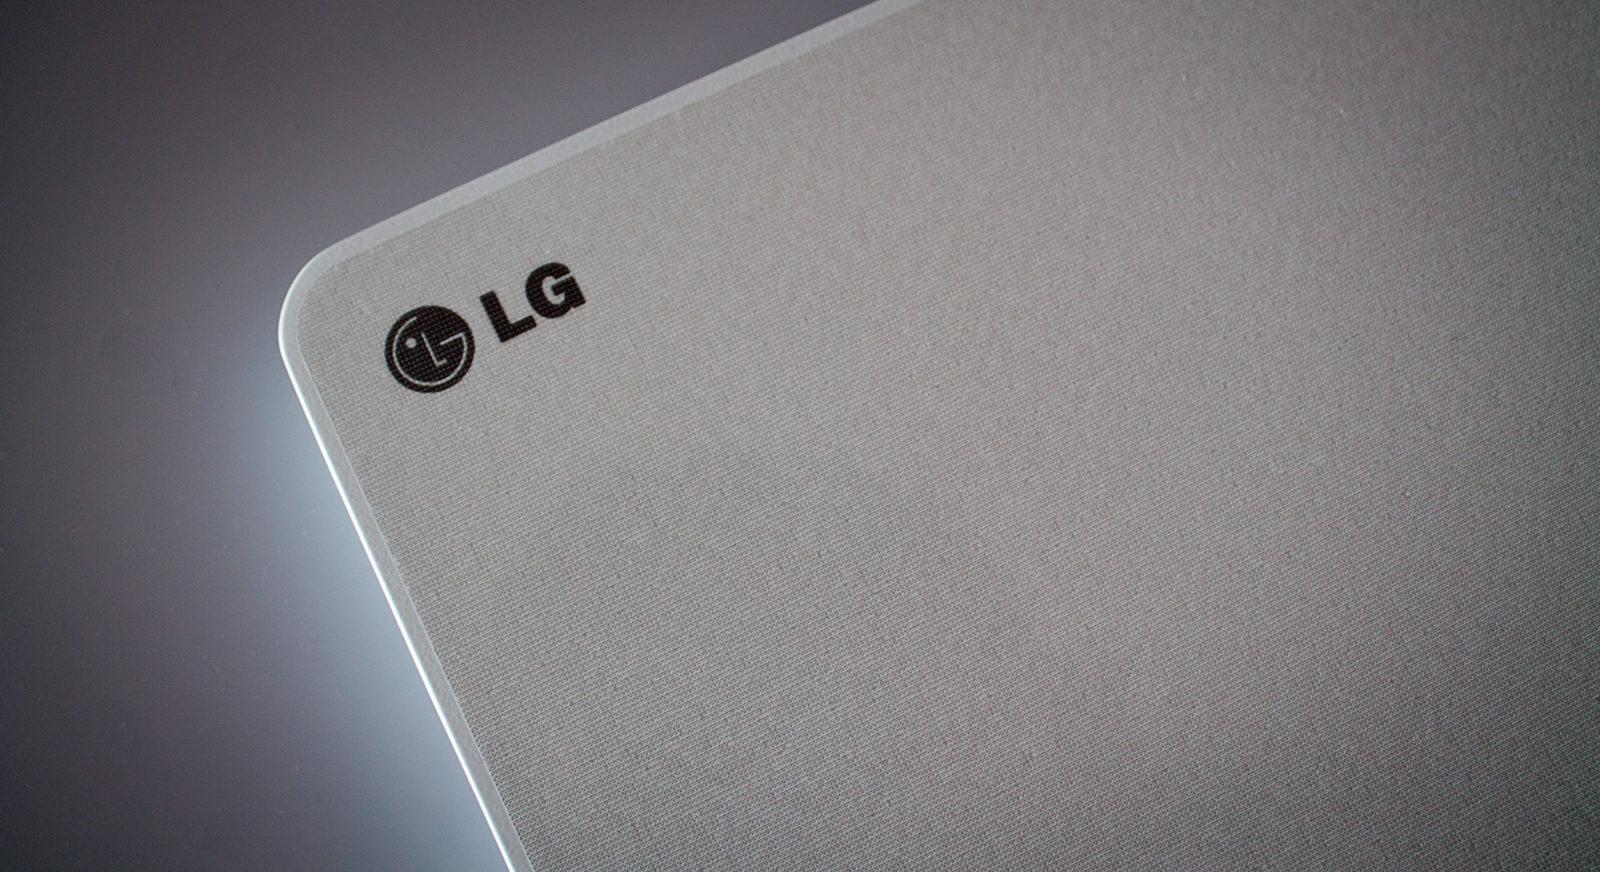 LG Z360 Ultrabook